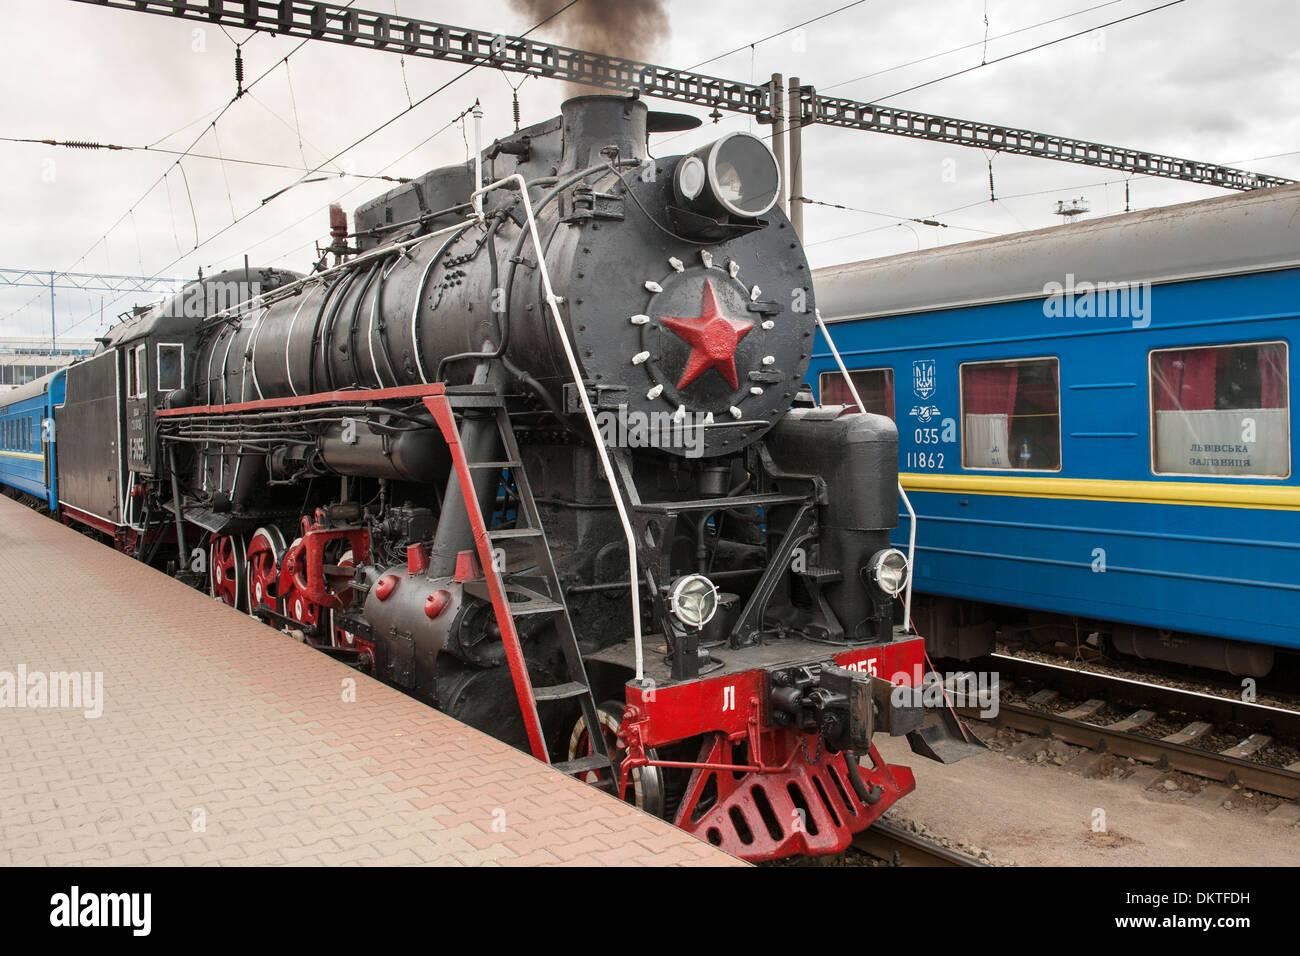 Old steam locomotive in the central station in Kiev, the capital of Ukraine. Stock Photo